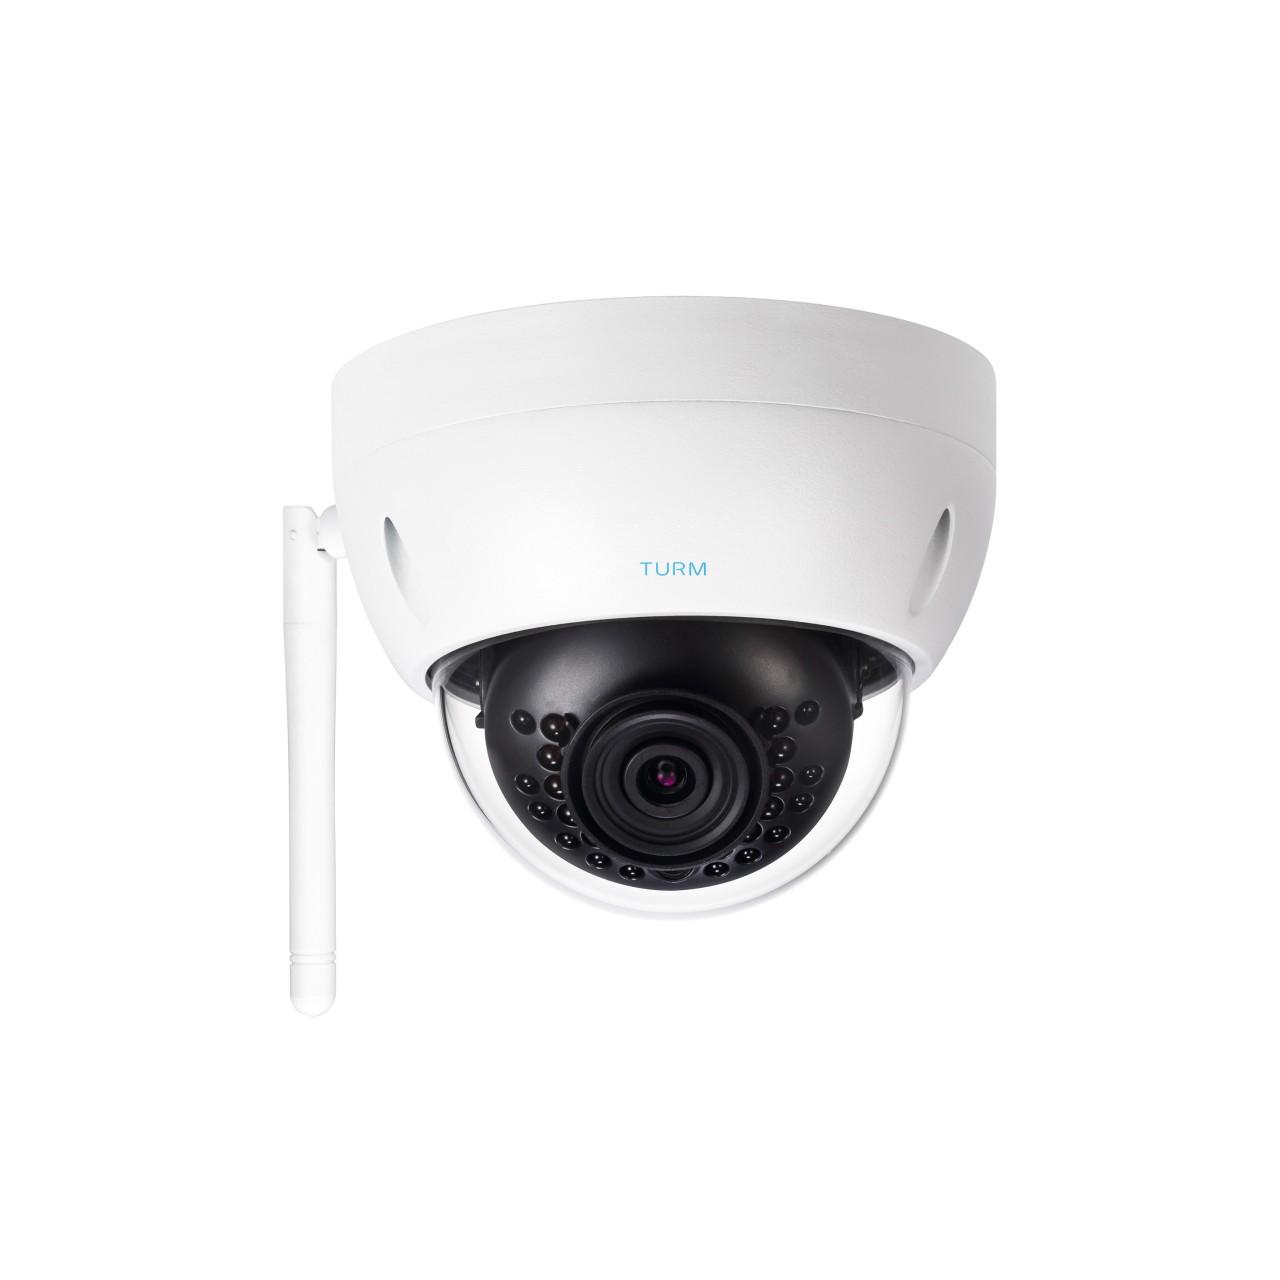 TURM WLAN 4 MP IP Dome Kamera mit 101°, 2.8mm, Micro SD Slot, 20m Nachtsicht, inkl. Netzteil